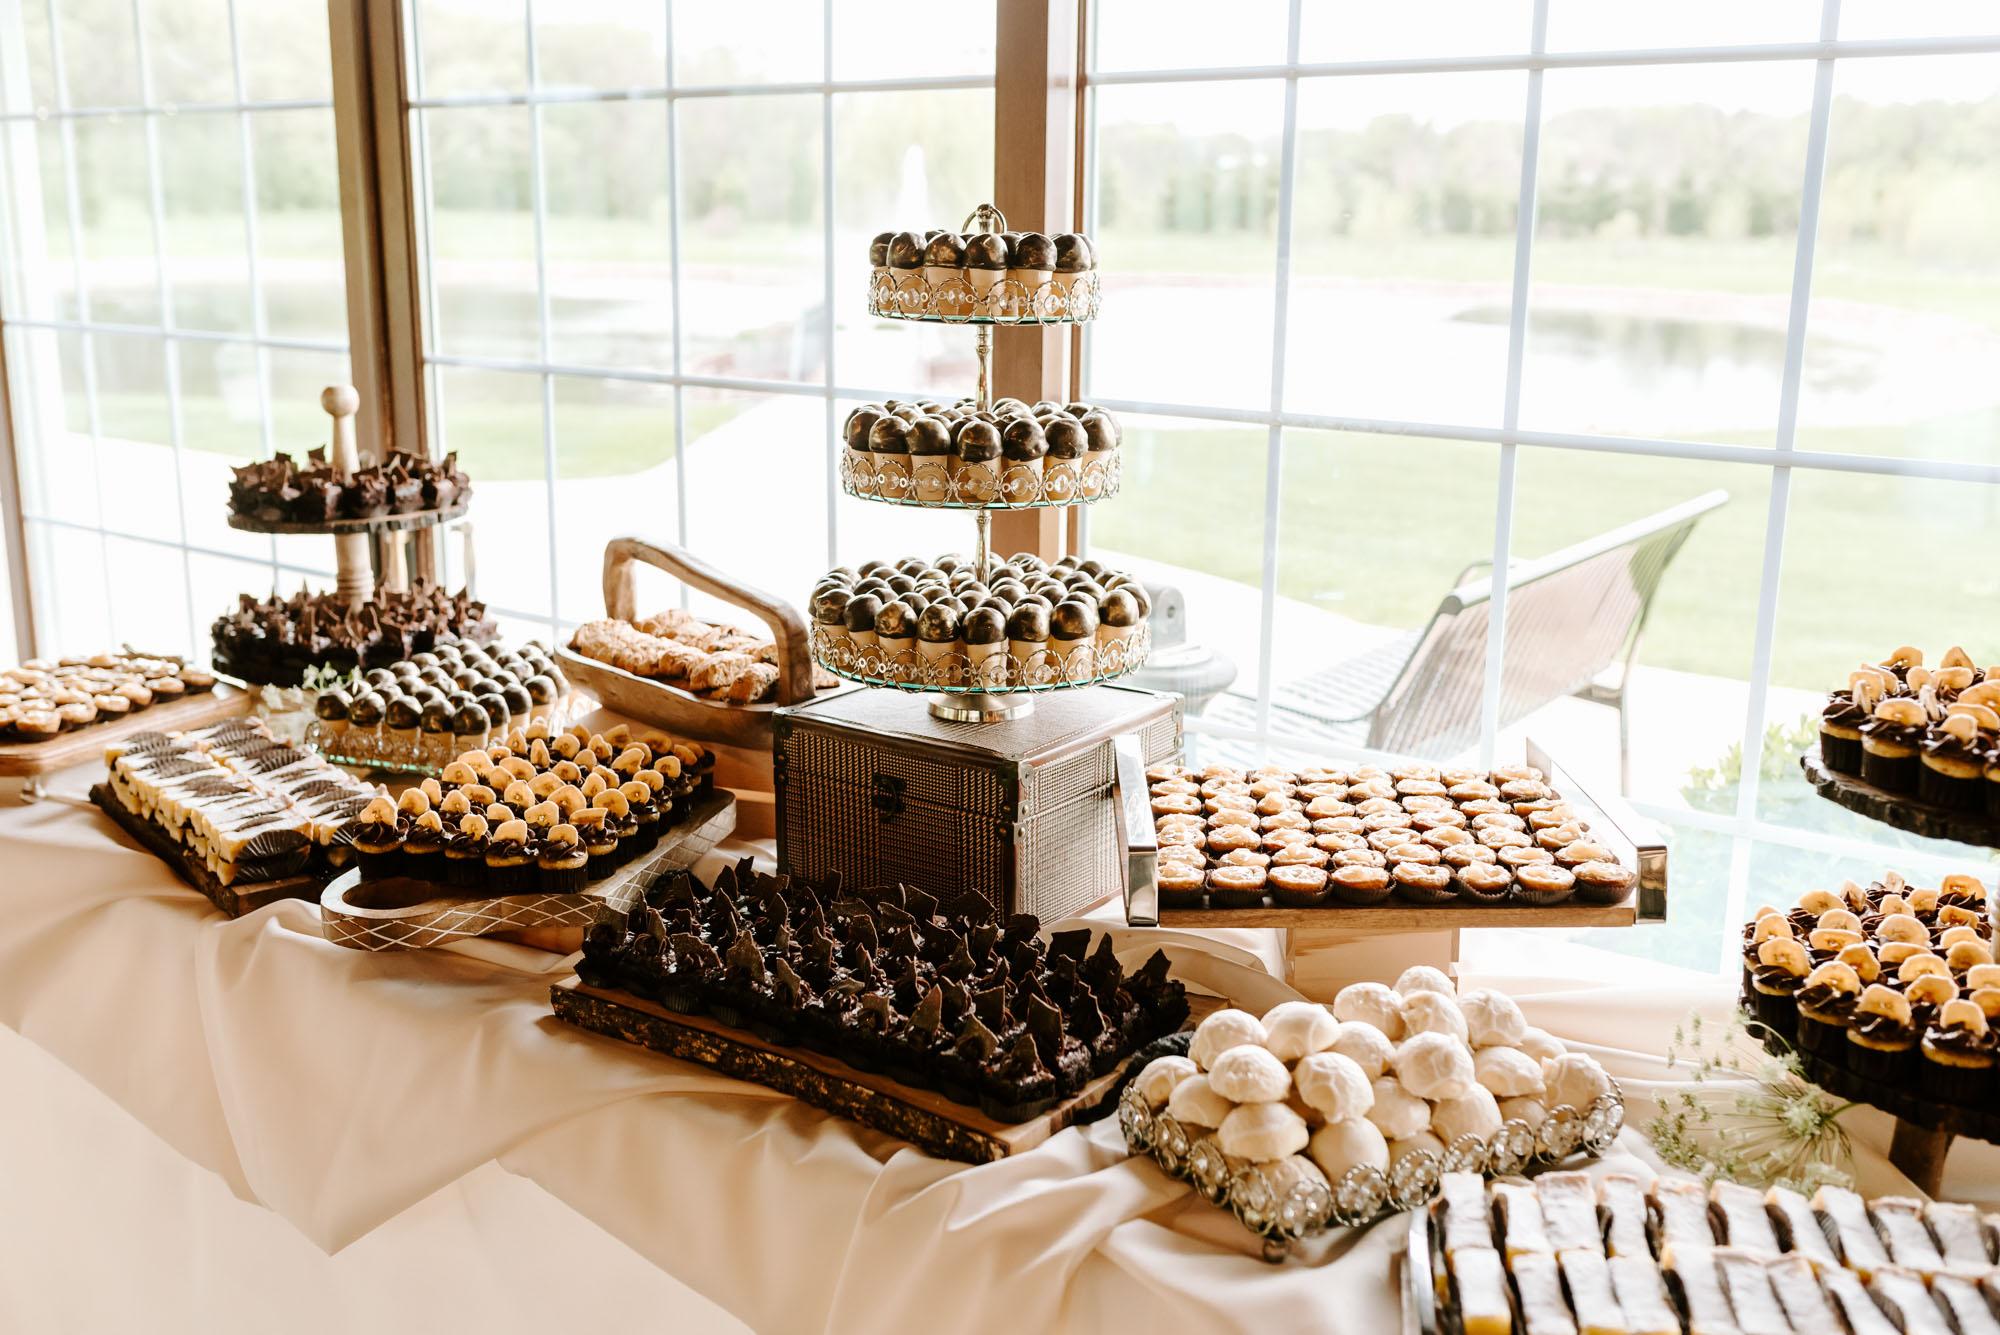 orchard-farms-pavillion-wedding-rockton-IL-wedding-photographers-237.jpg